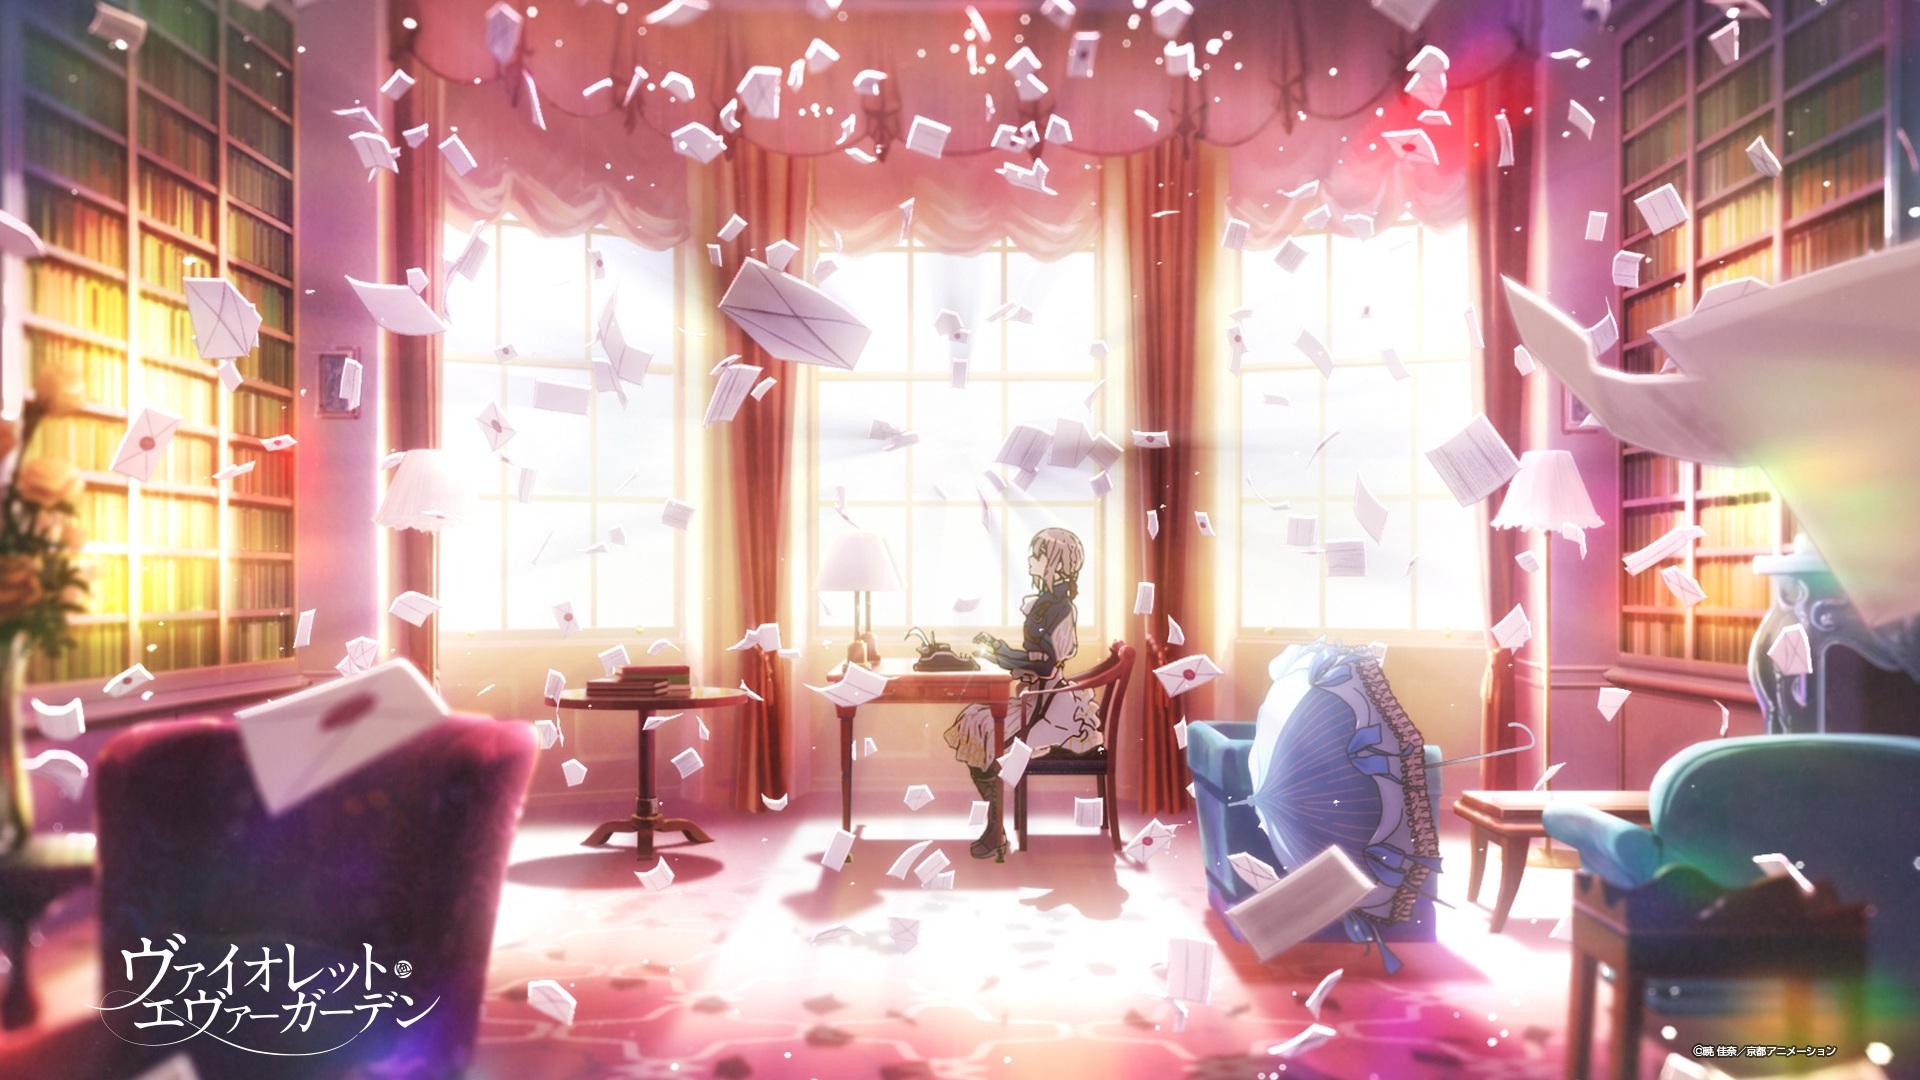 Violet Evergarden OP - Sincerely [難道: ★★★★✰]  [PDF]  - Rearranged-